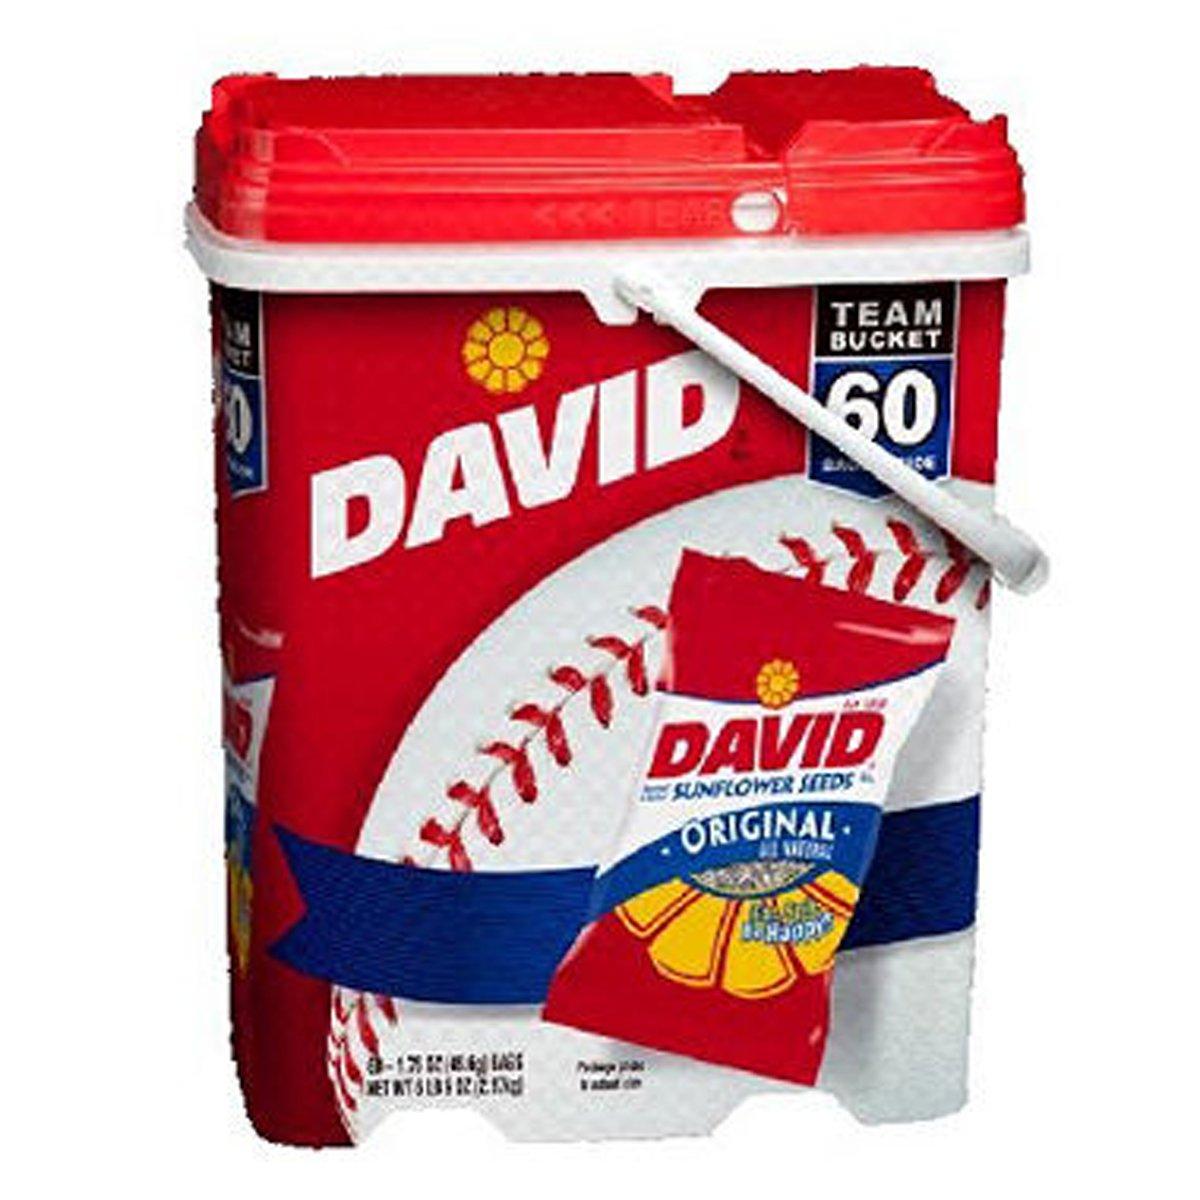 SCS David Sunflower Seed Bucket - 1.75 oz. pk. - 60 ct.